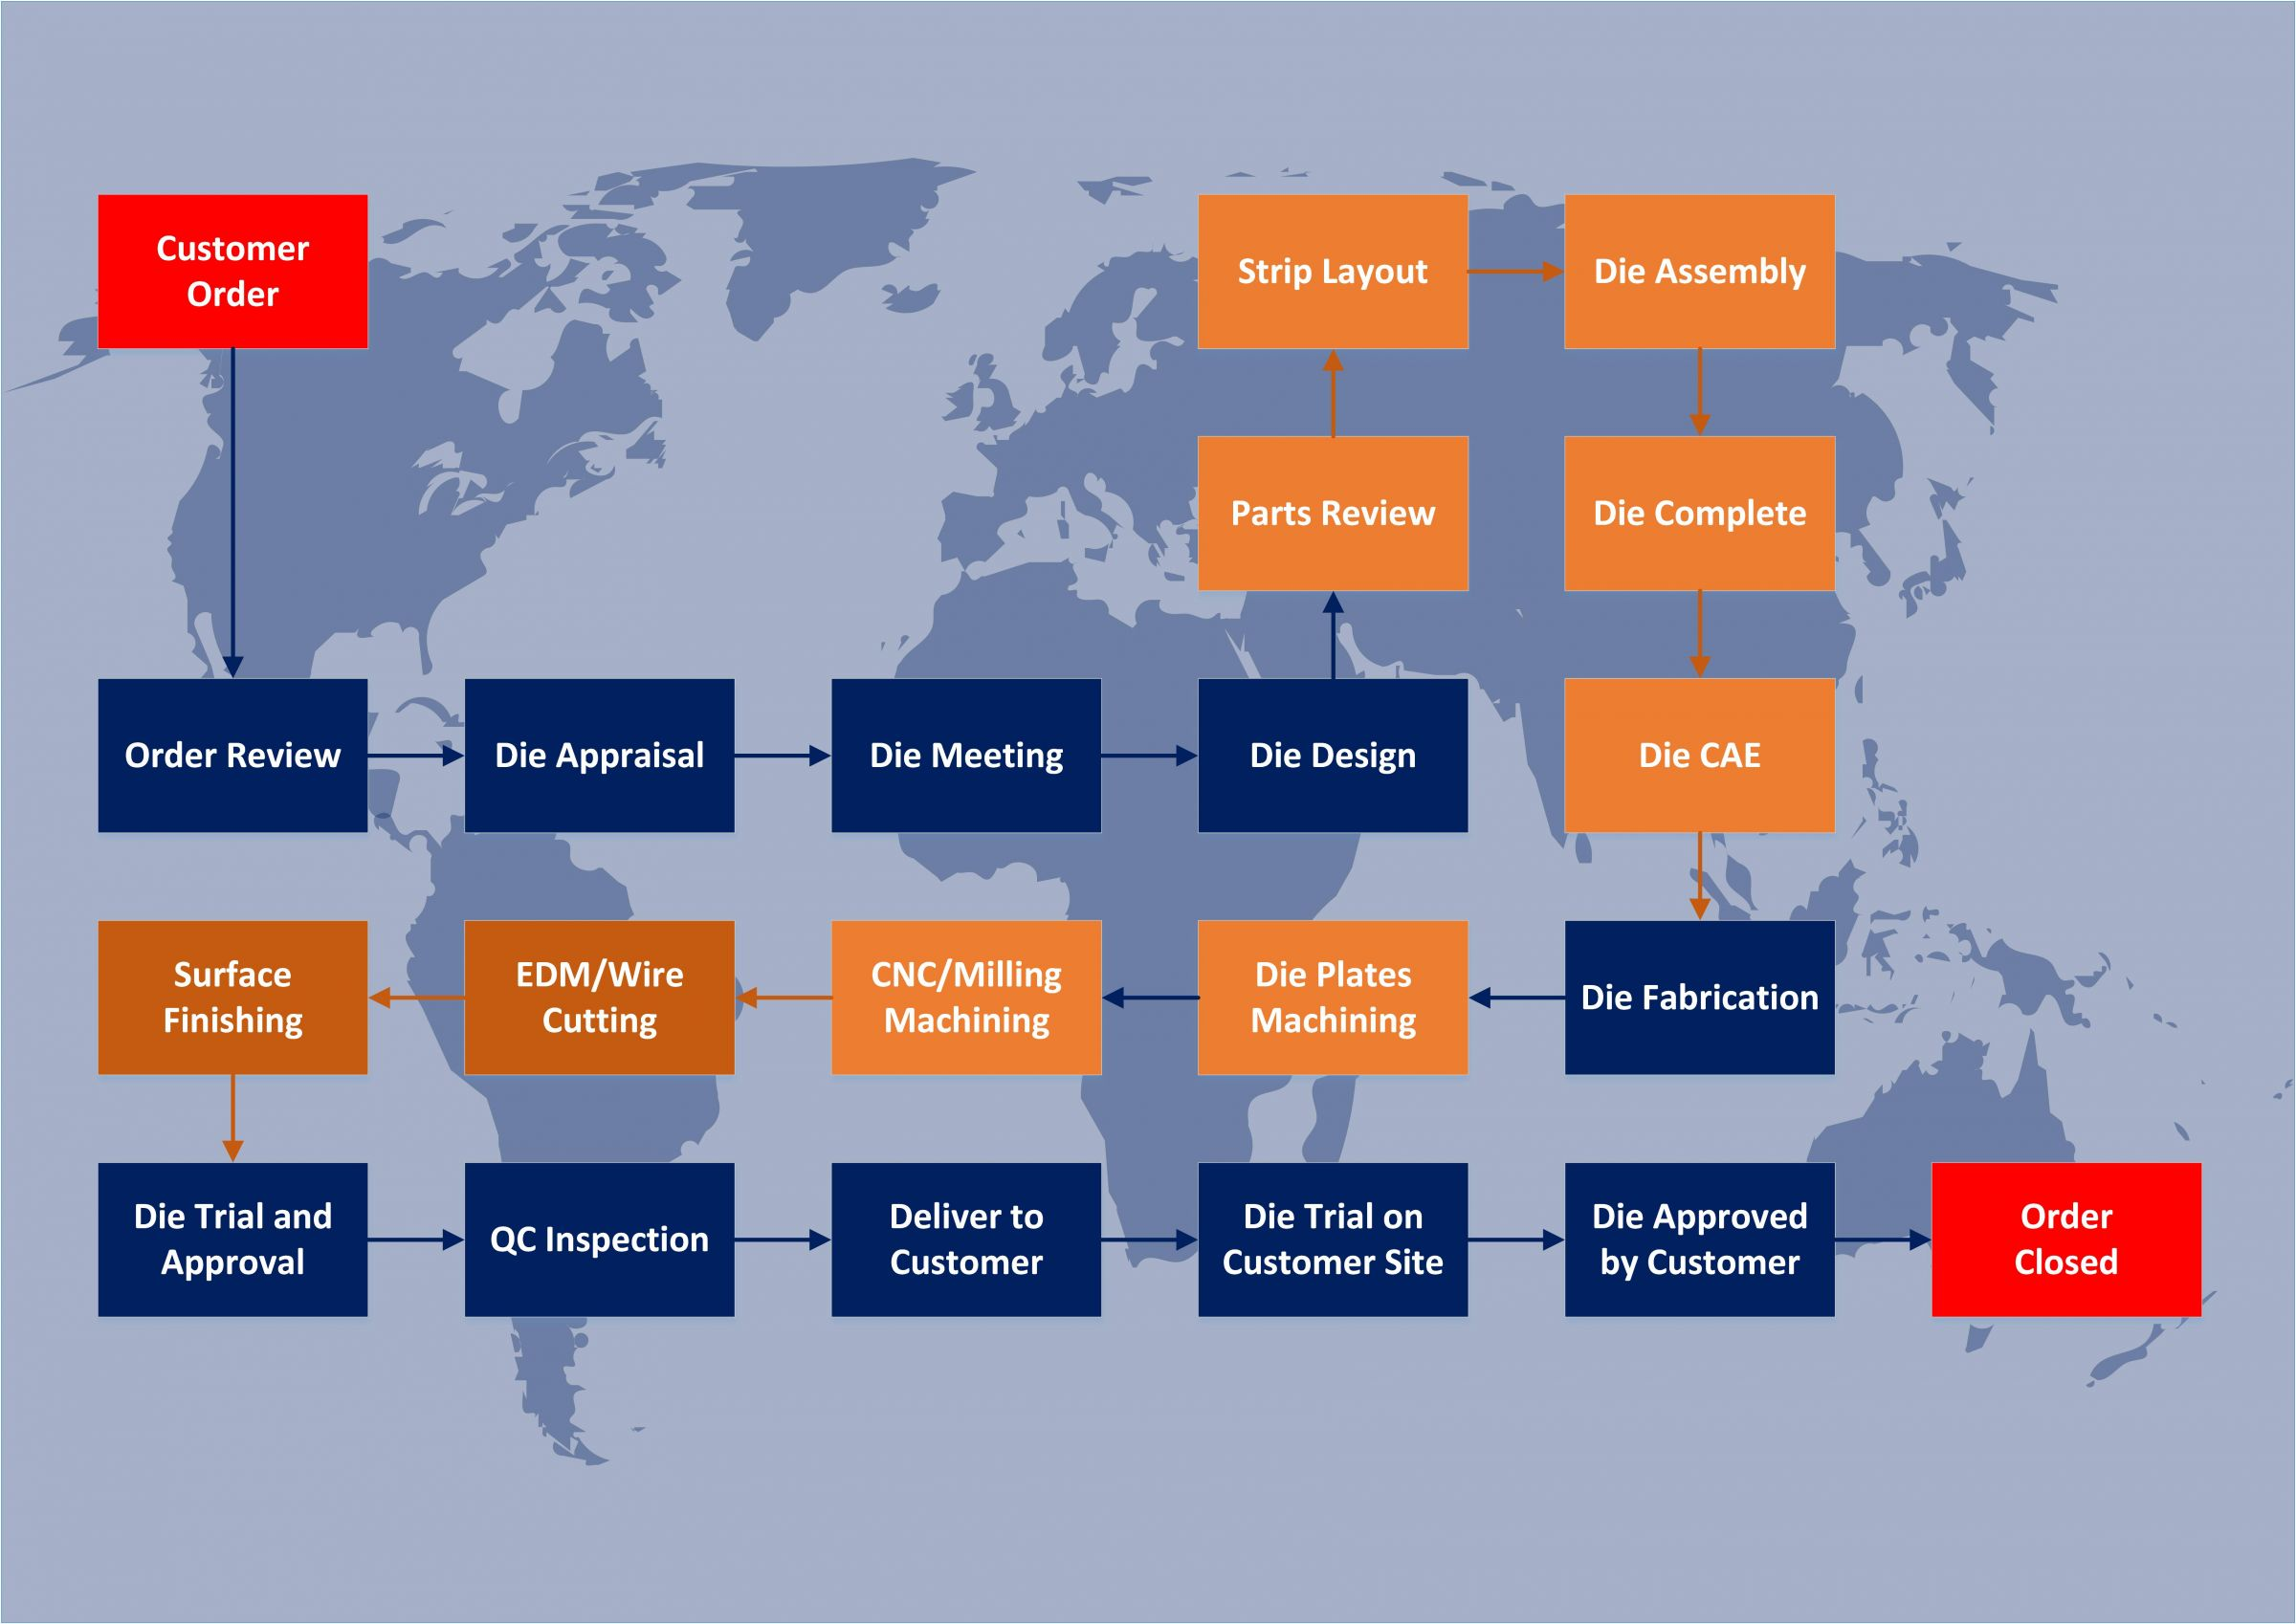 Customized Die Design Flow Chart